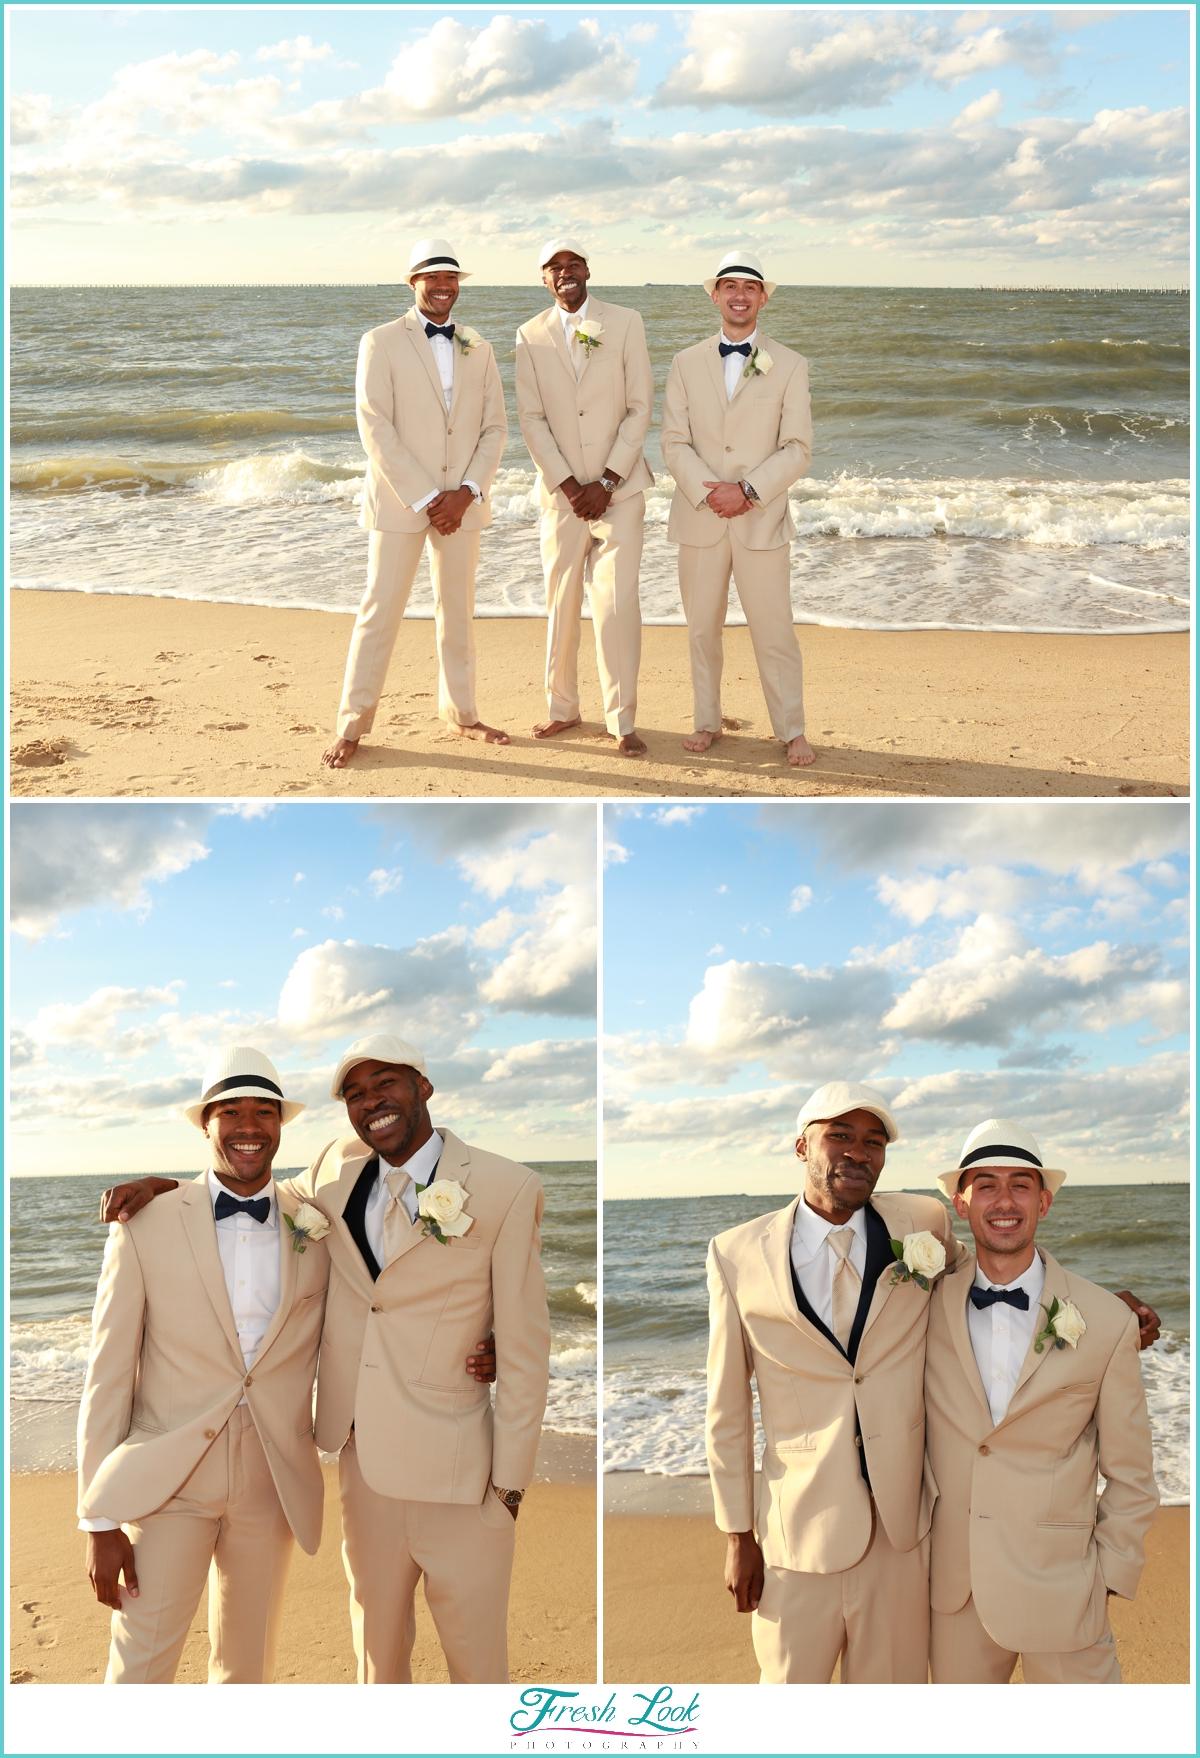 groomsmen photos on the beach